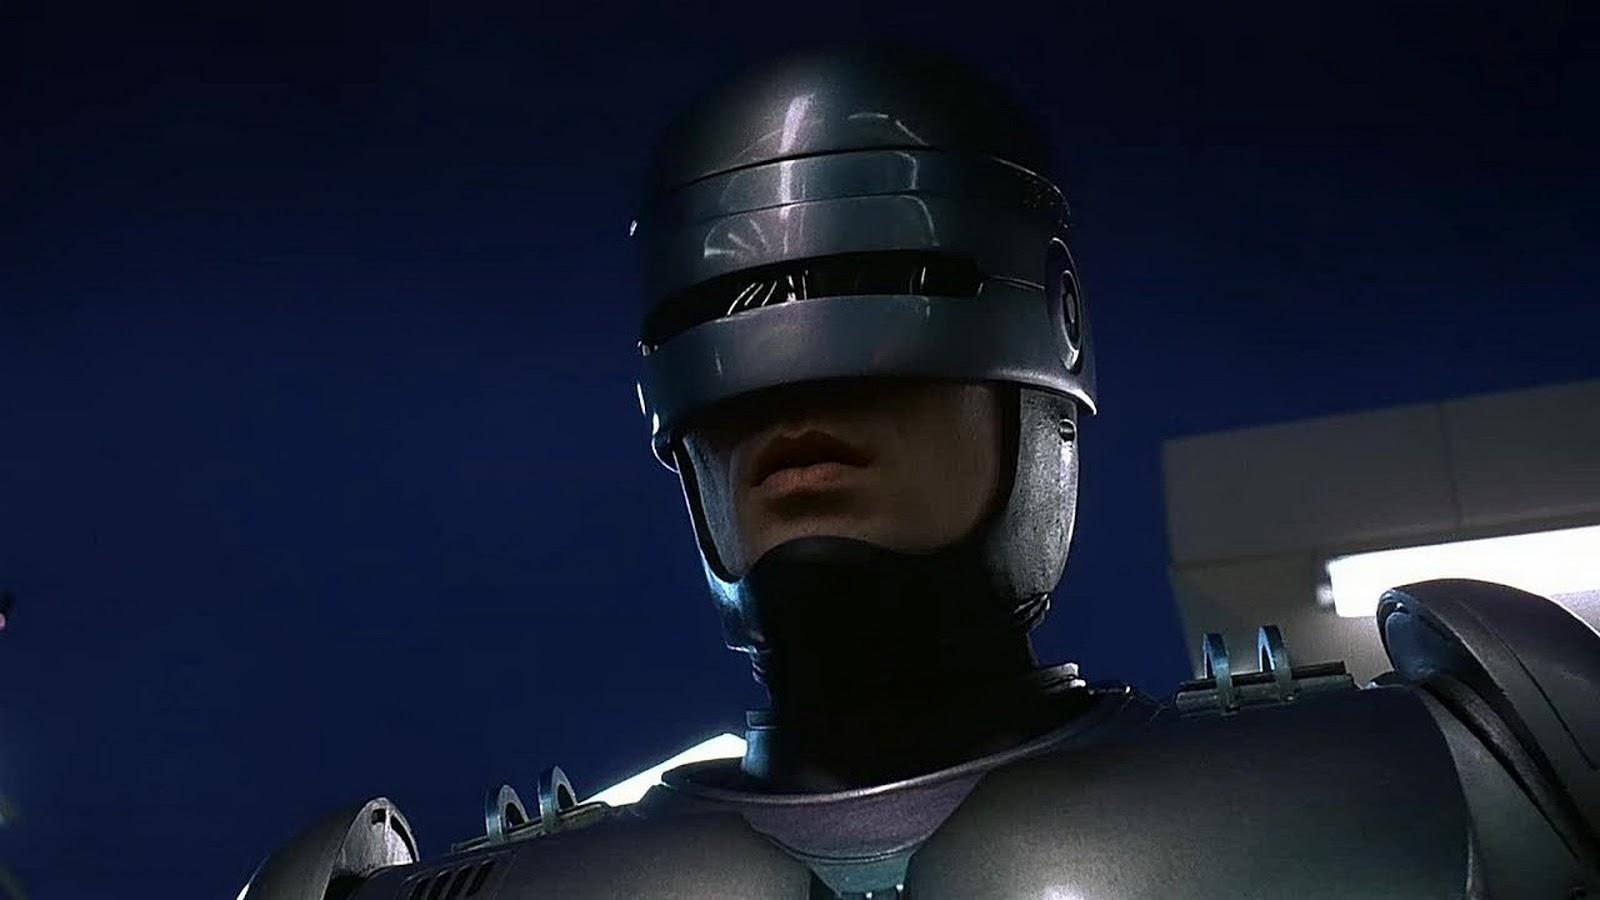 http://1.bp.blogspot.com/-SbXOROb046s/UBY-2dFYy5I/AAAAAAAAG4E/EUUVQbextqY/s1600/RoboCop-1987-Wallpaper-5.jpg